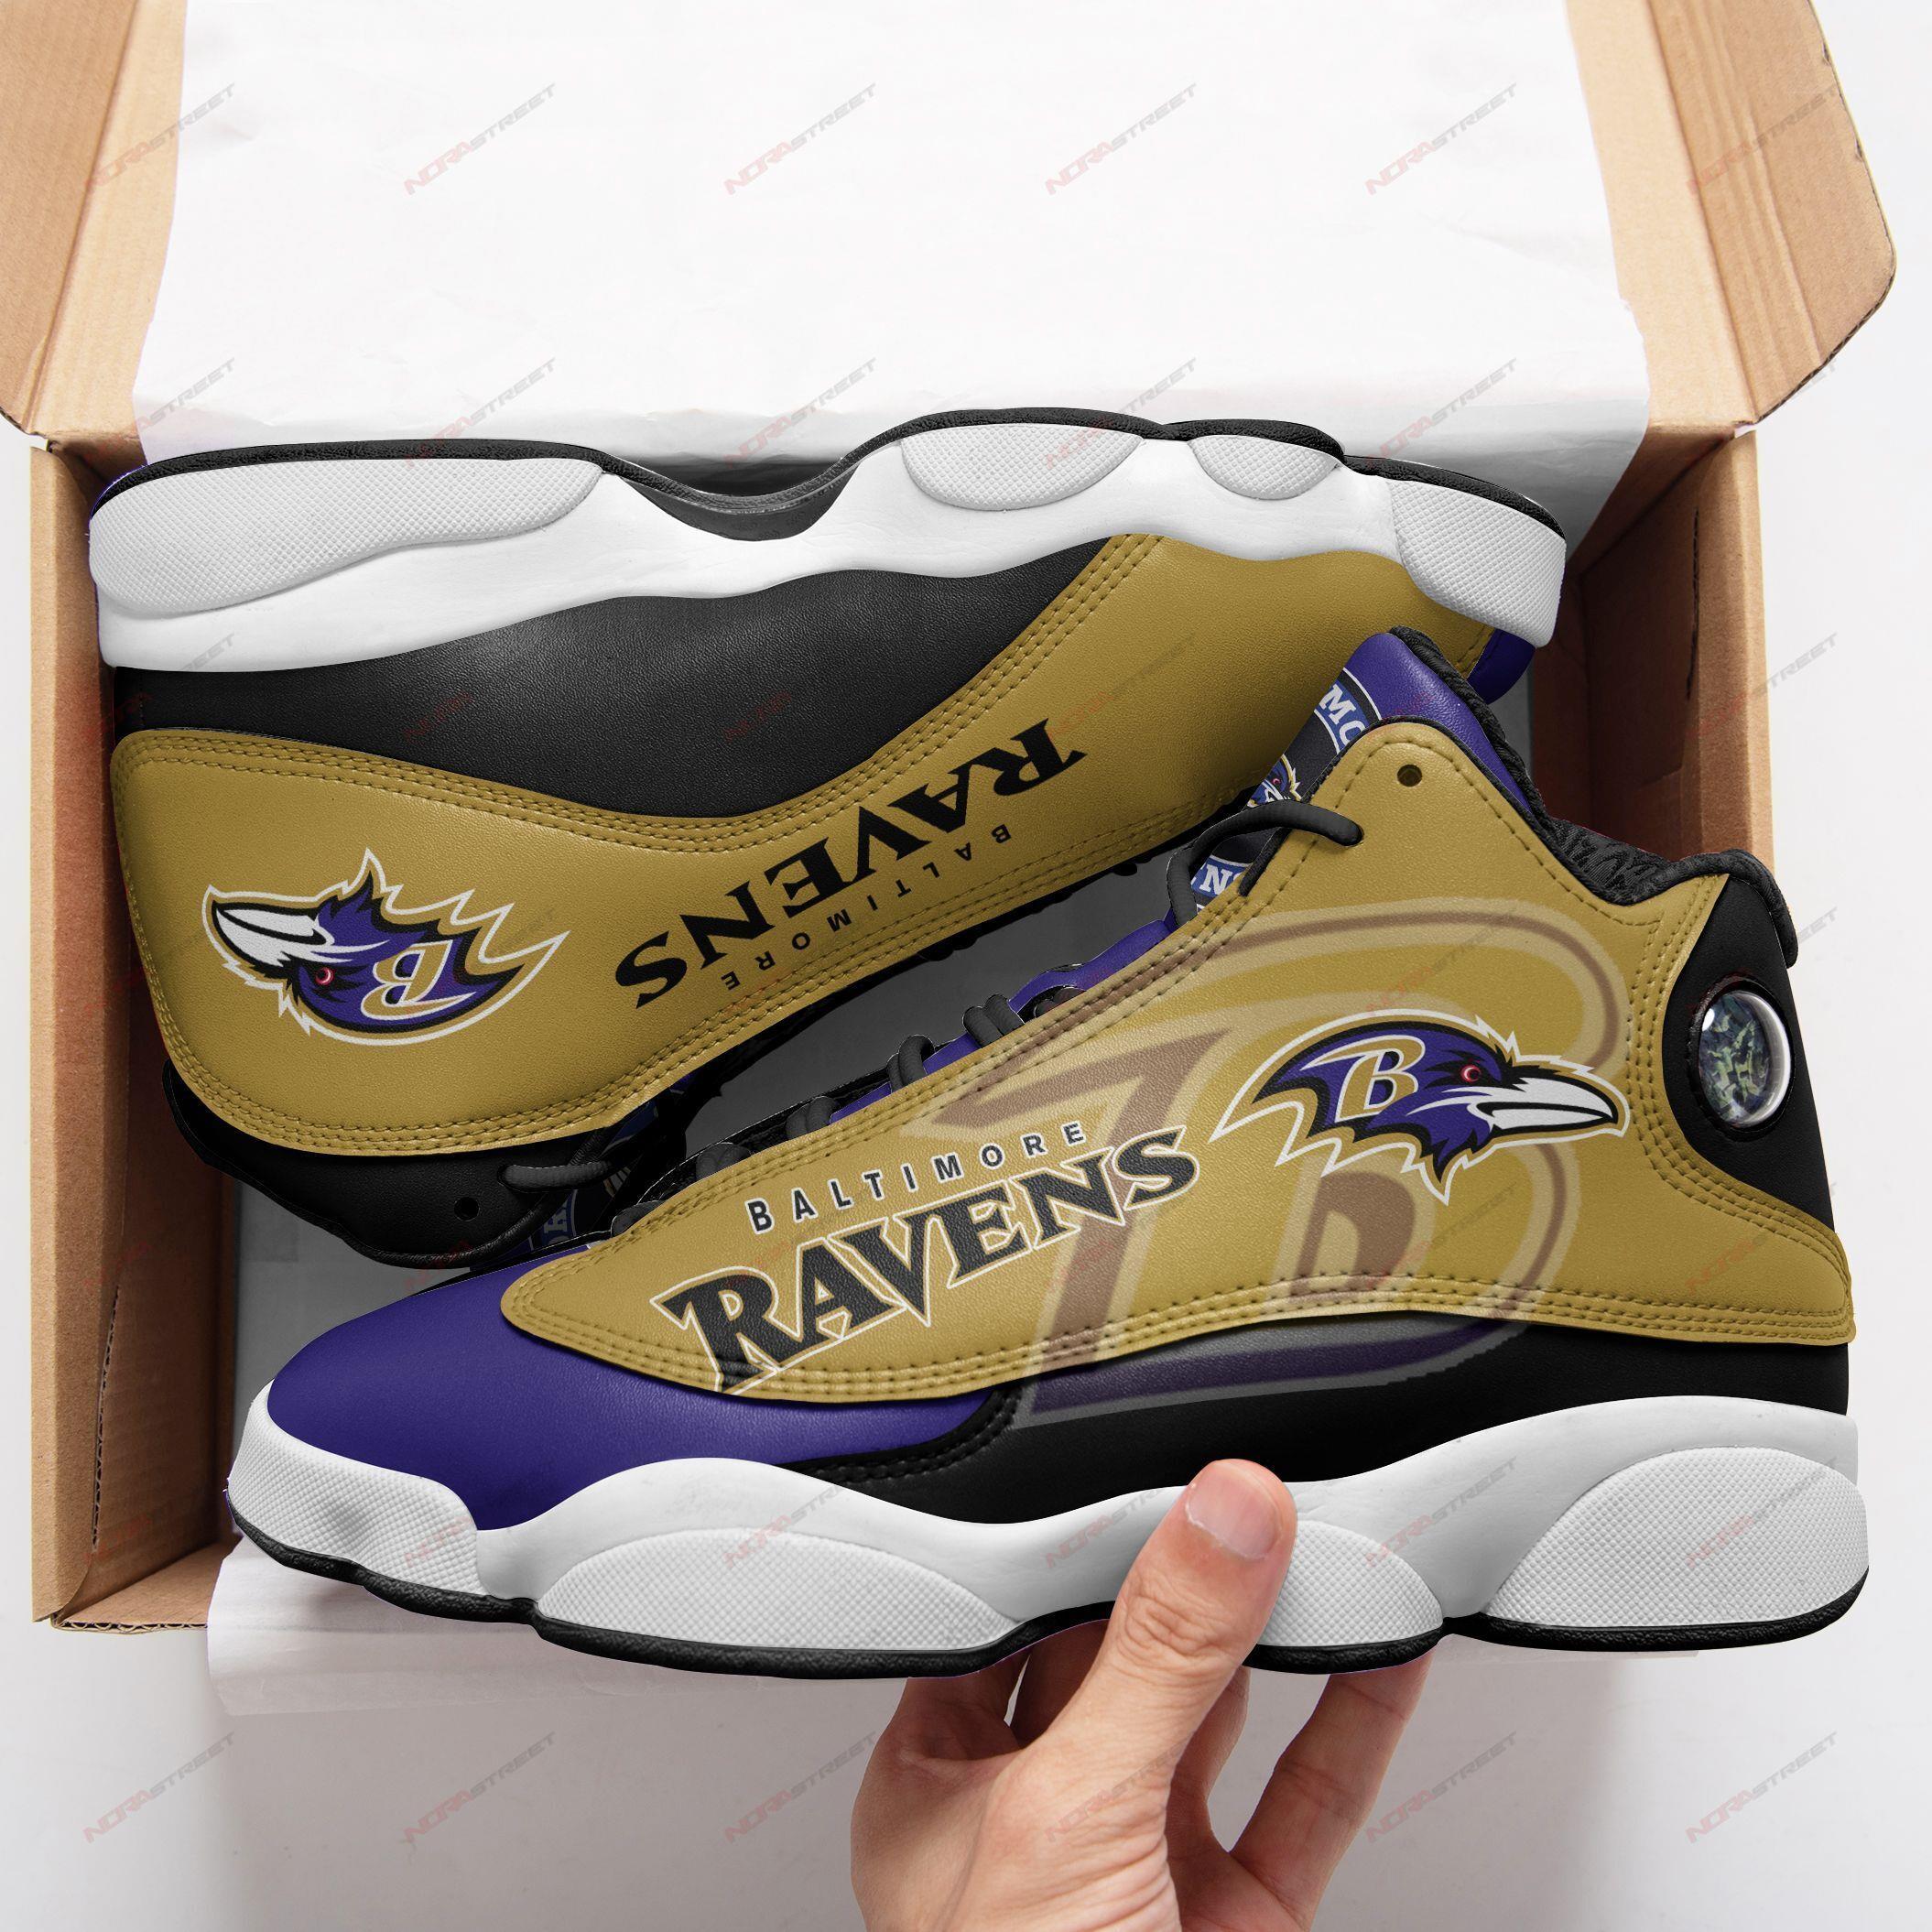 Baltimore Ravens Air Jordan 13 Sneakers Sport Shoes Plus Size